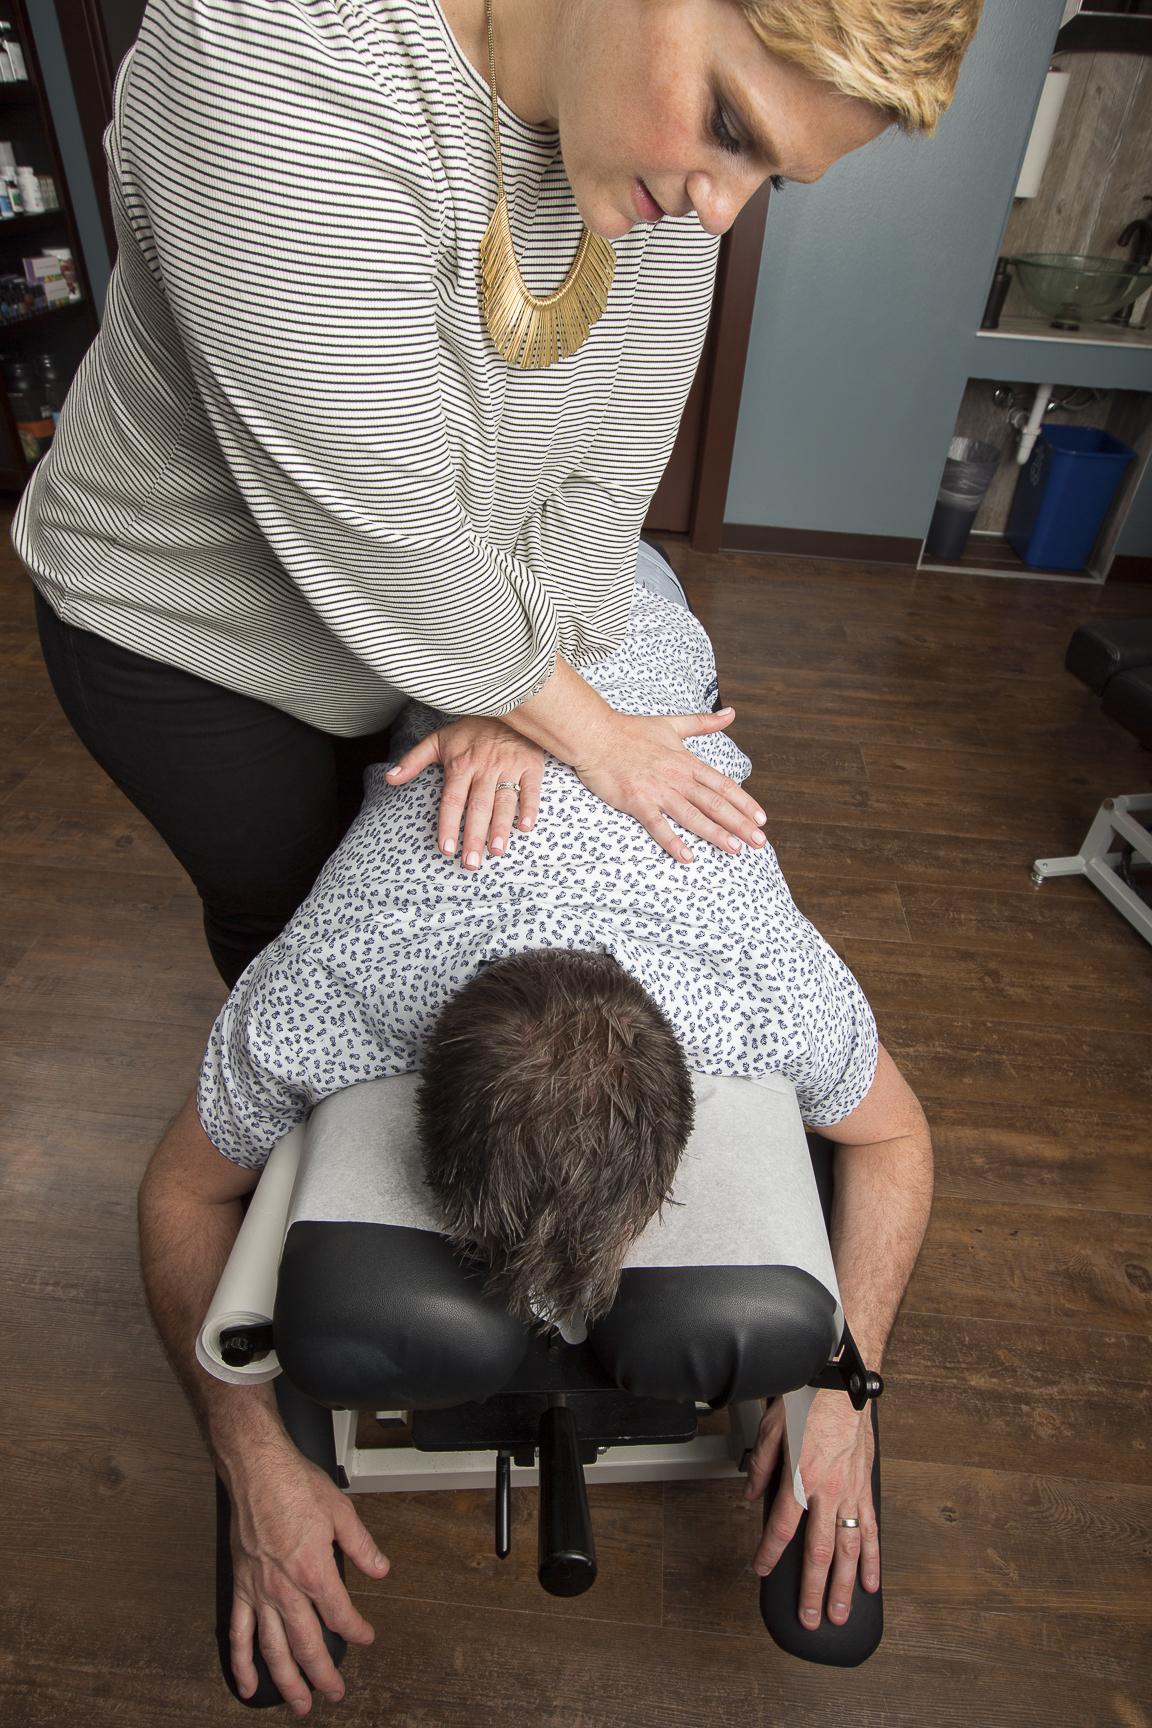 Thrive Chiropractic, Minnetonka, MN, Chiropractic Services